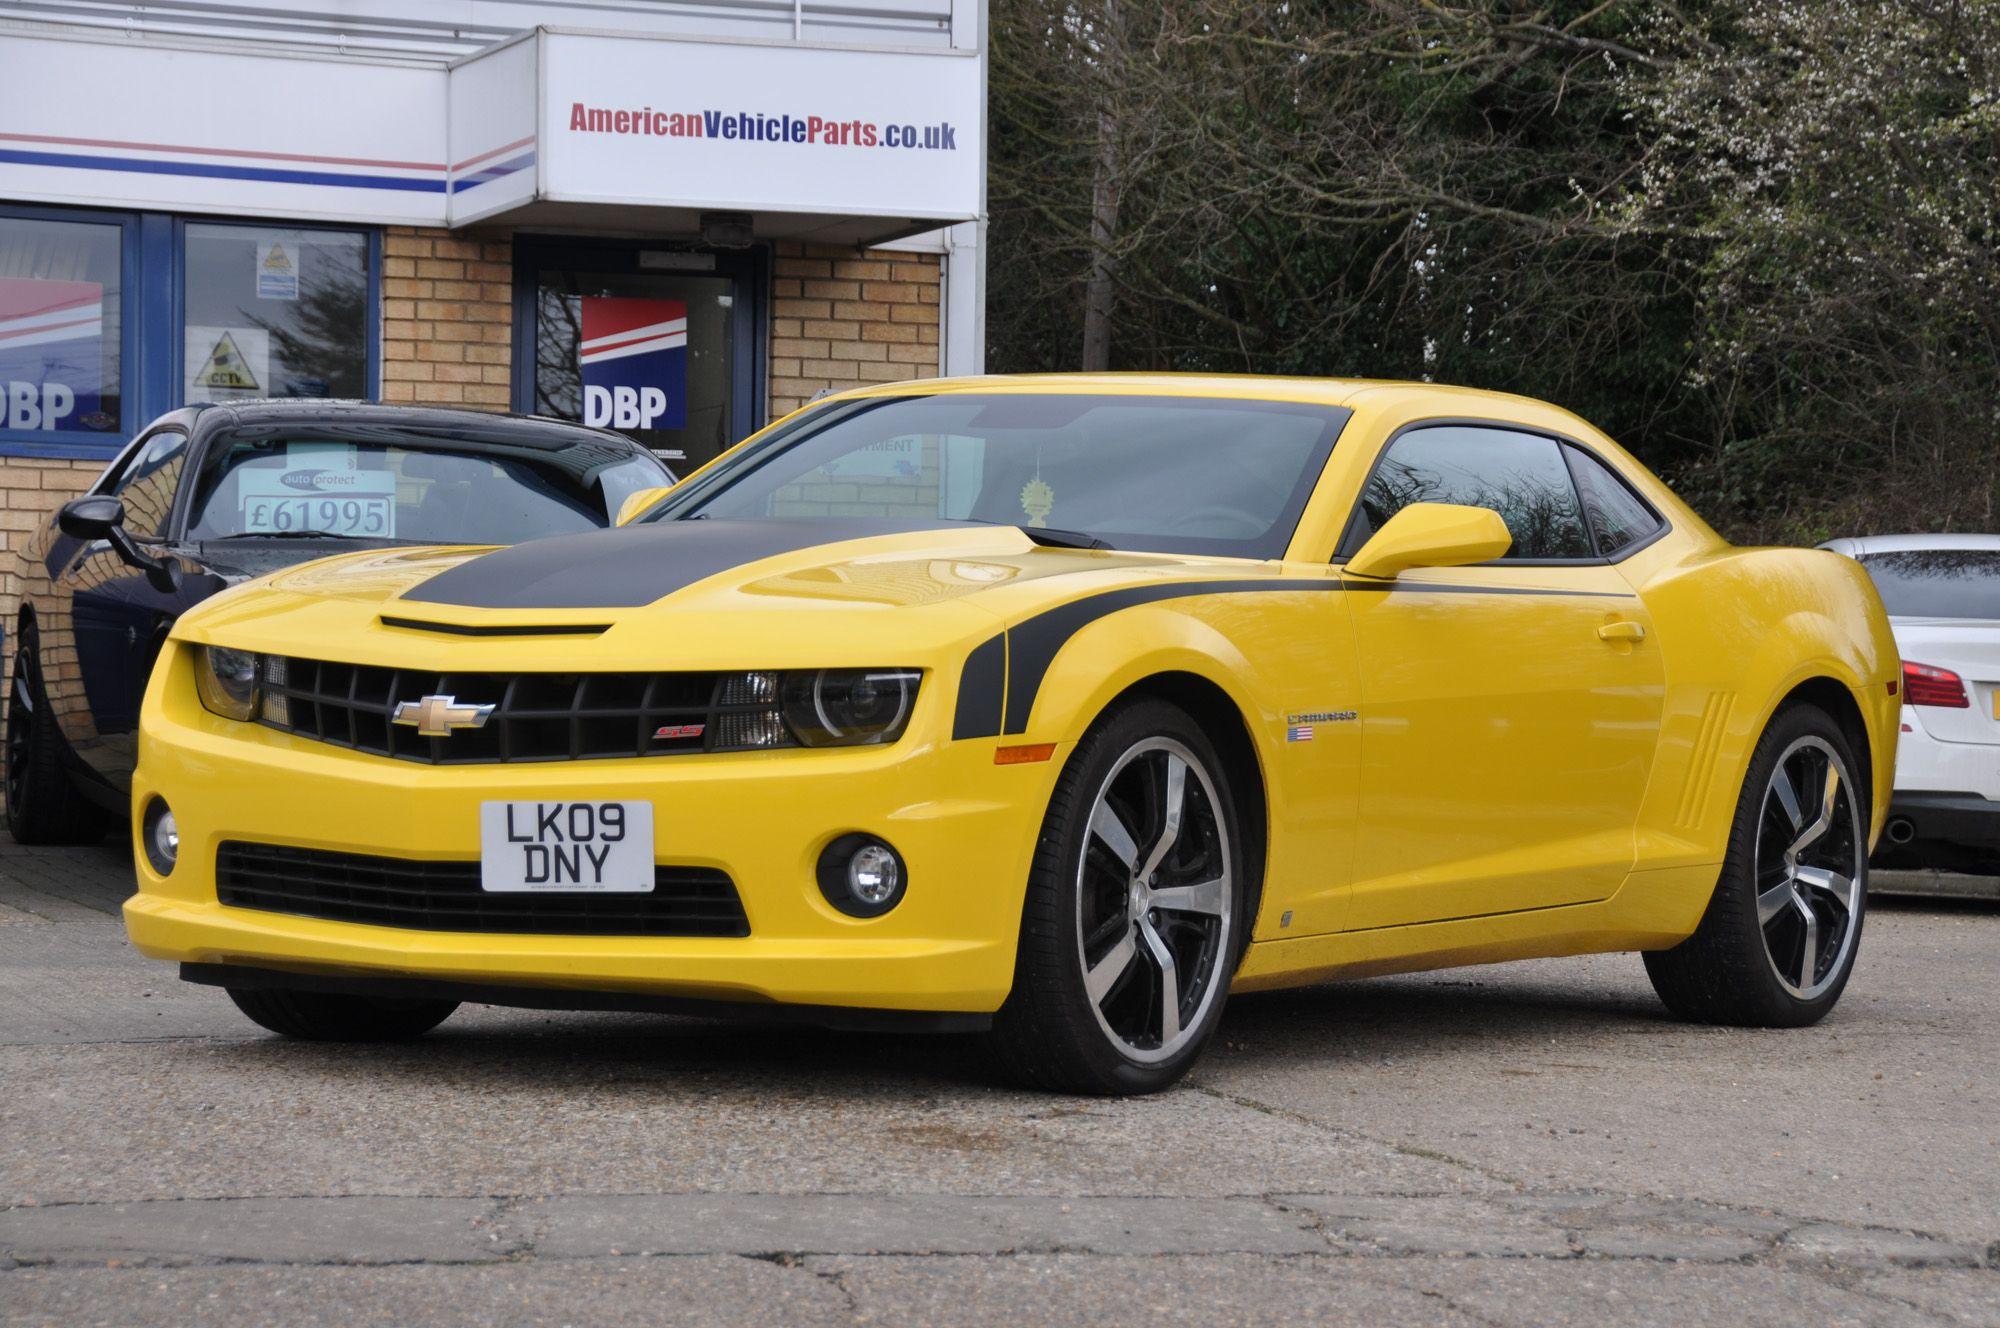 Chevrolet Camaro 2ss 6 2 Litre V8 Auto In Yellow Chevrolet